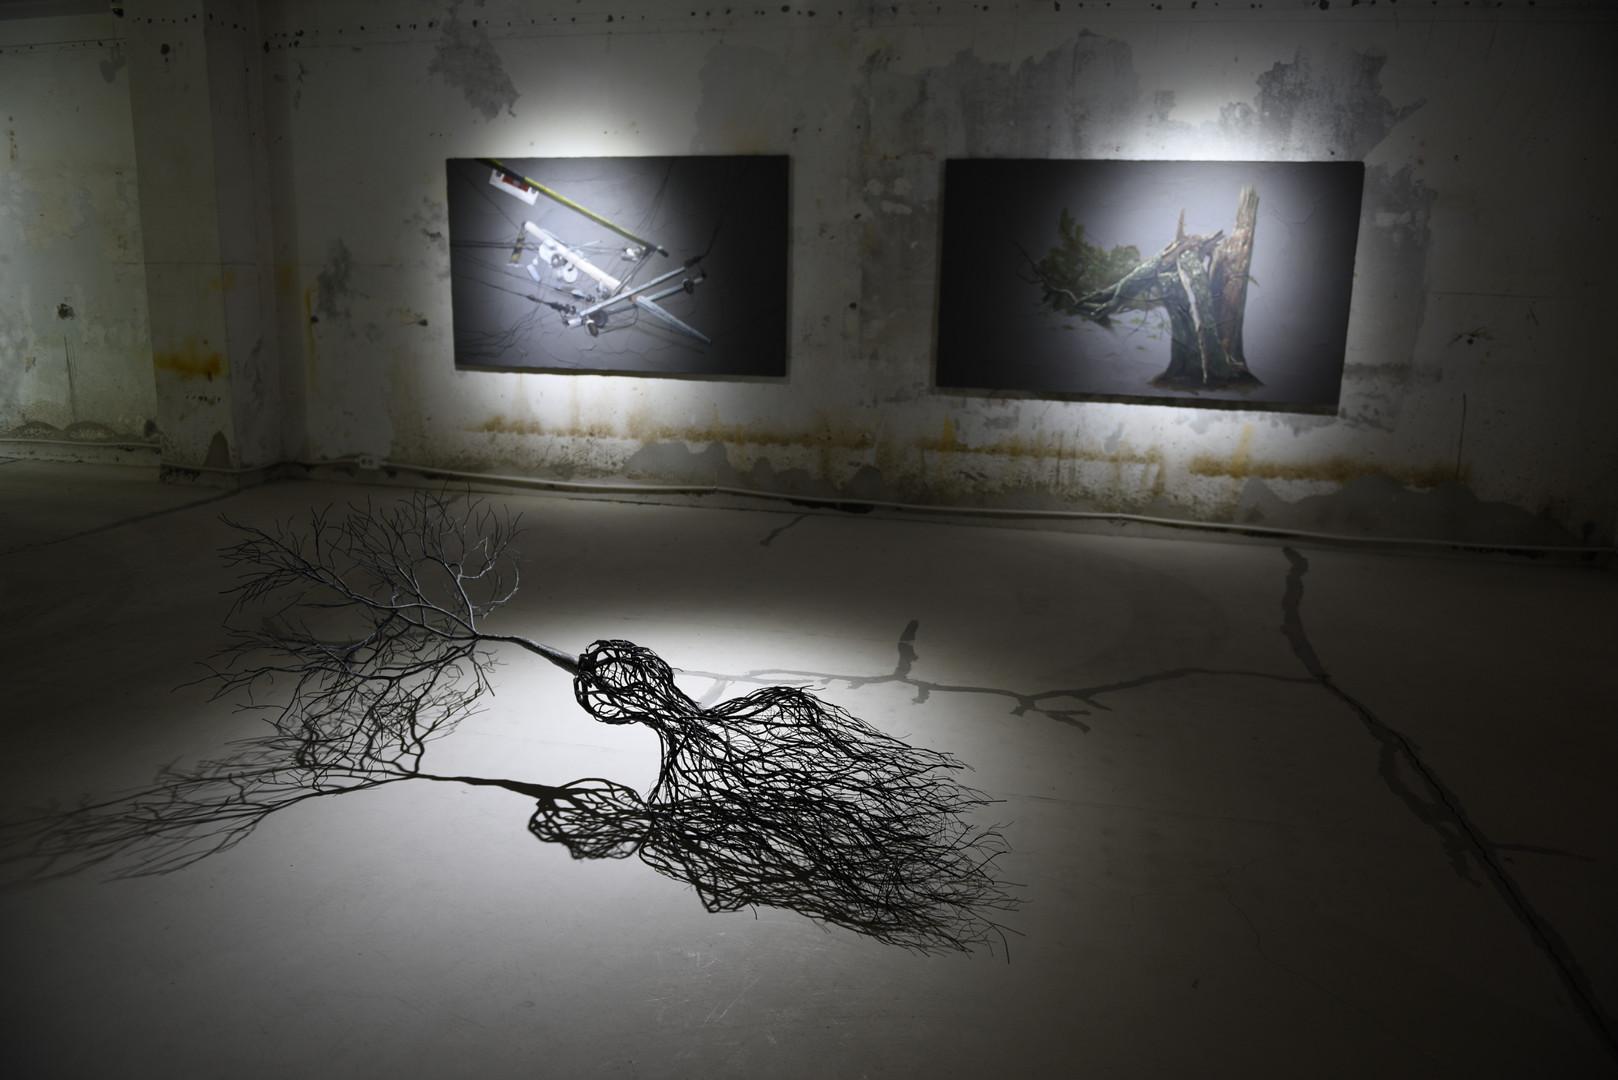 (2) An unpredictable day, installation view